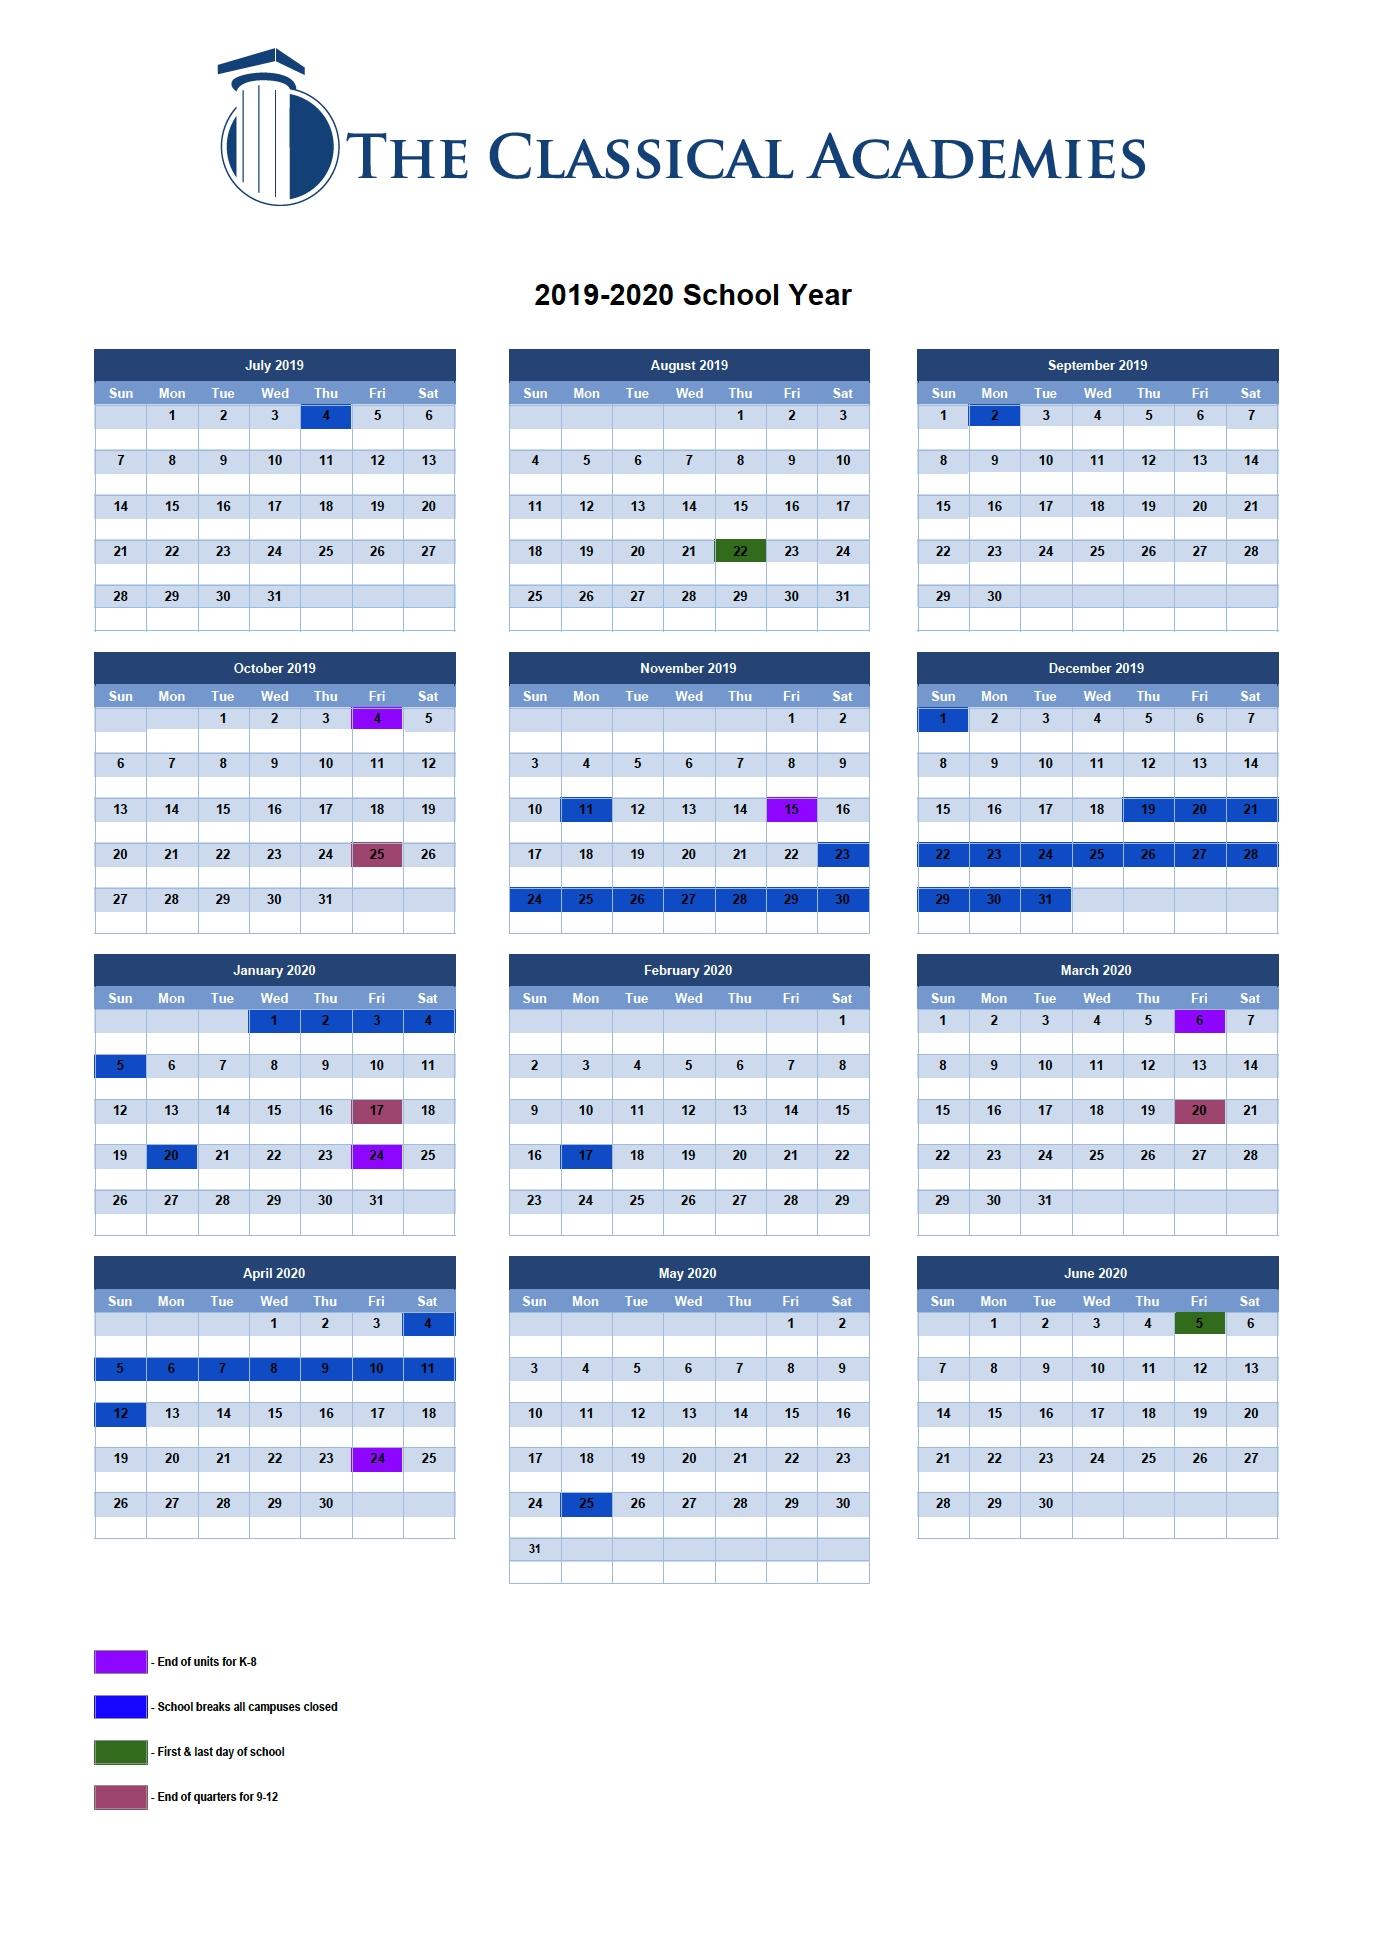 Instructional Calendar - The Classical Academies